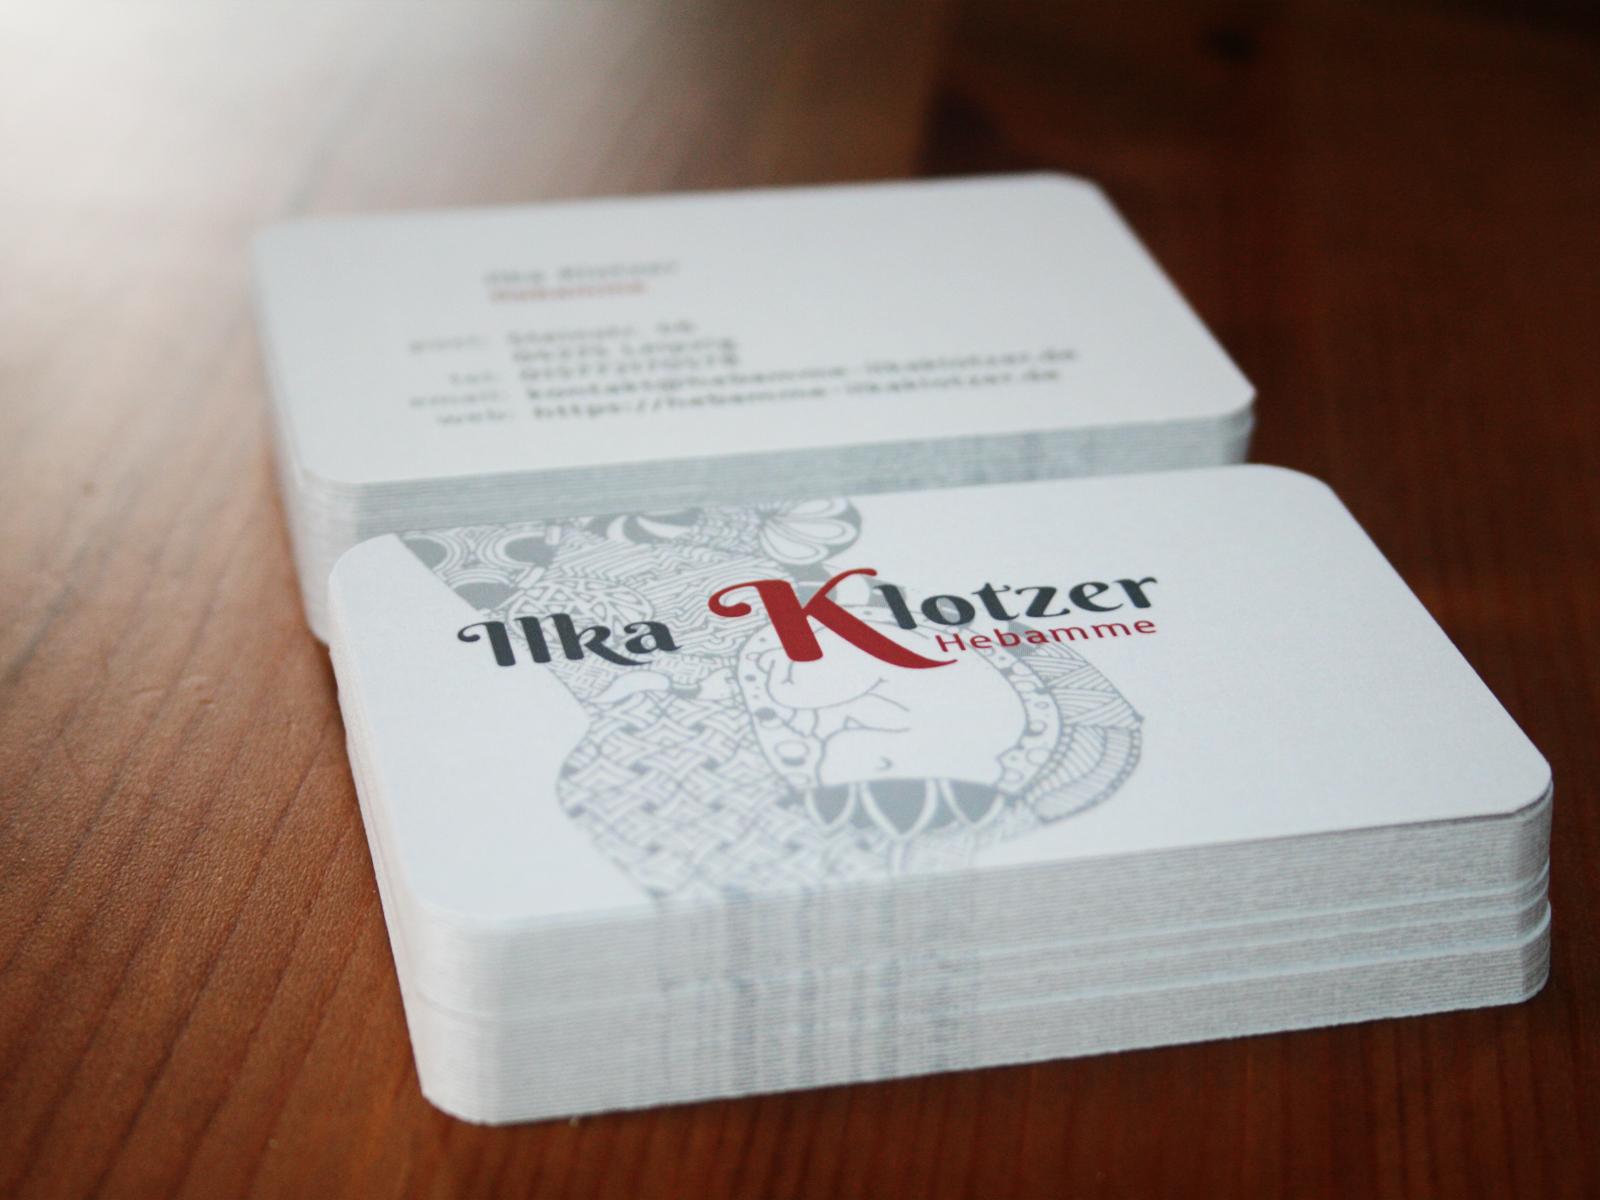 Grafikdesign Visitenkarten, Hebamme Leipzig, Ilka Klotzer